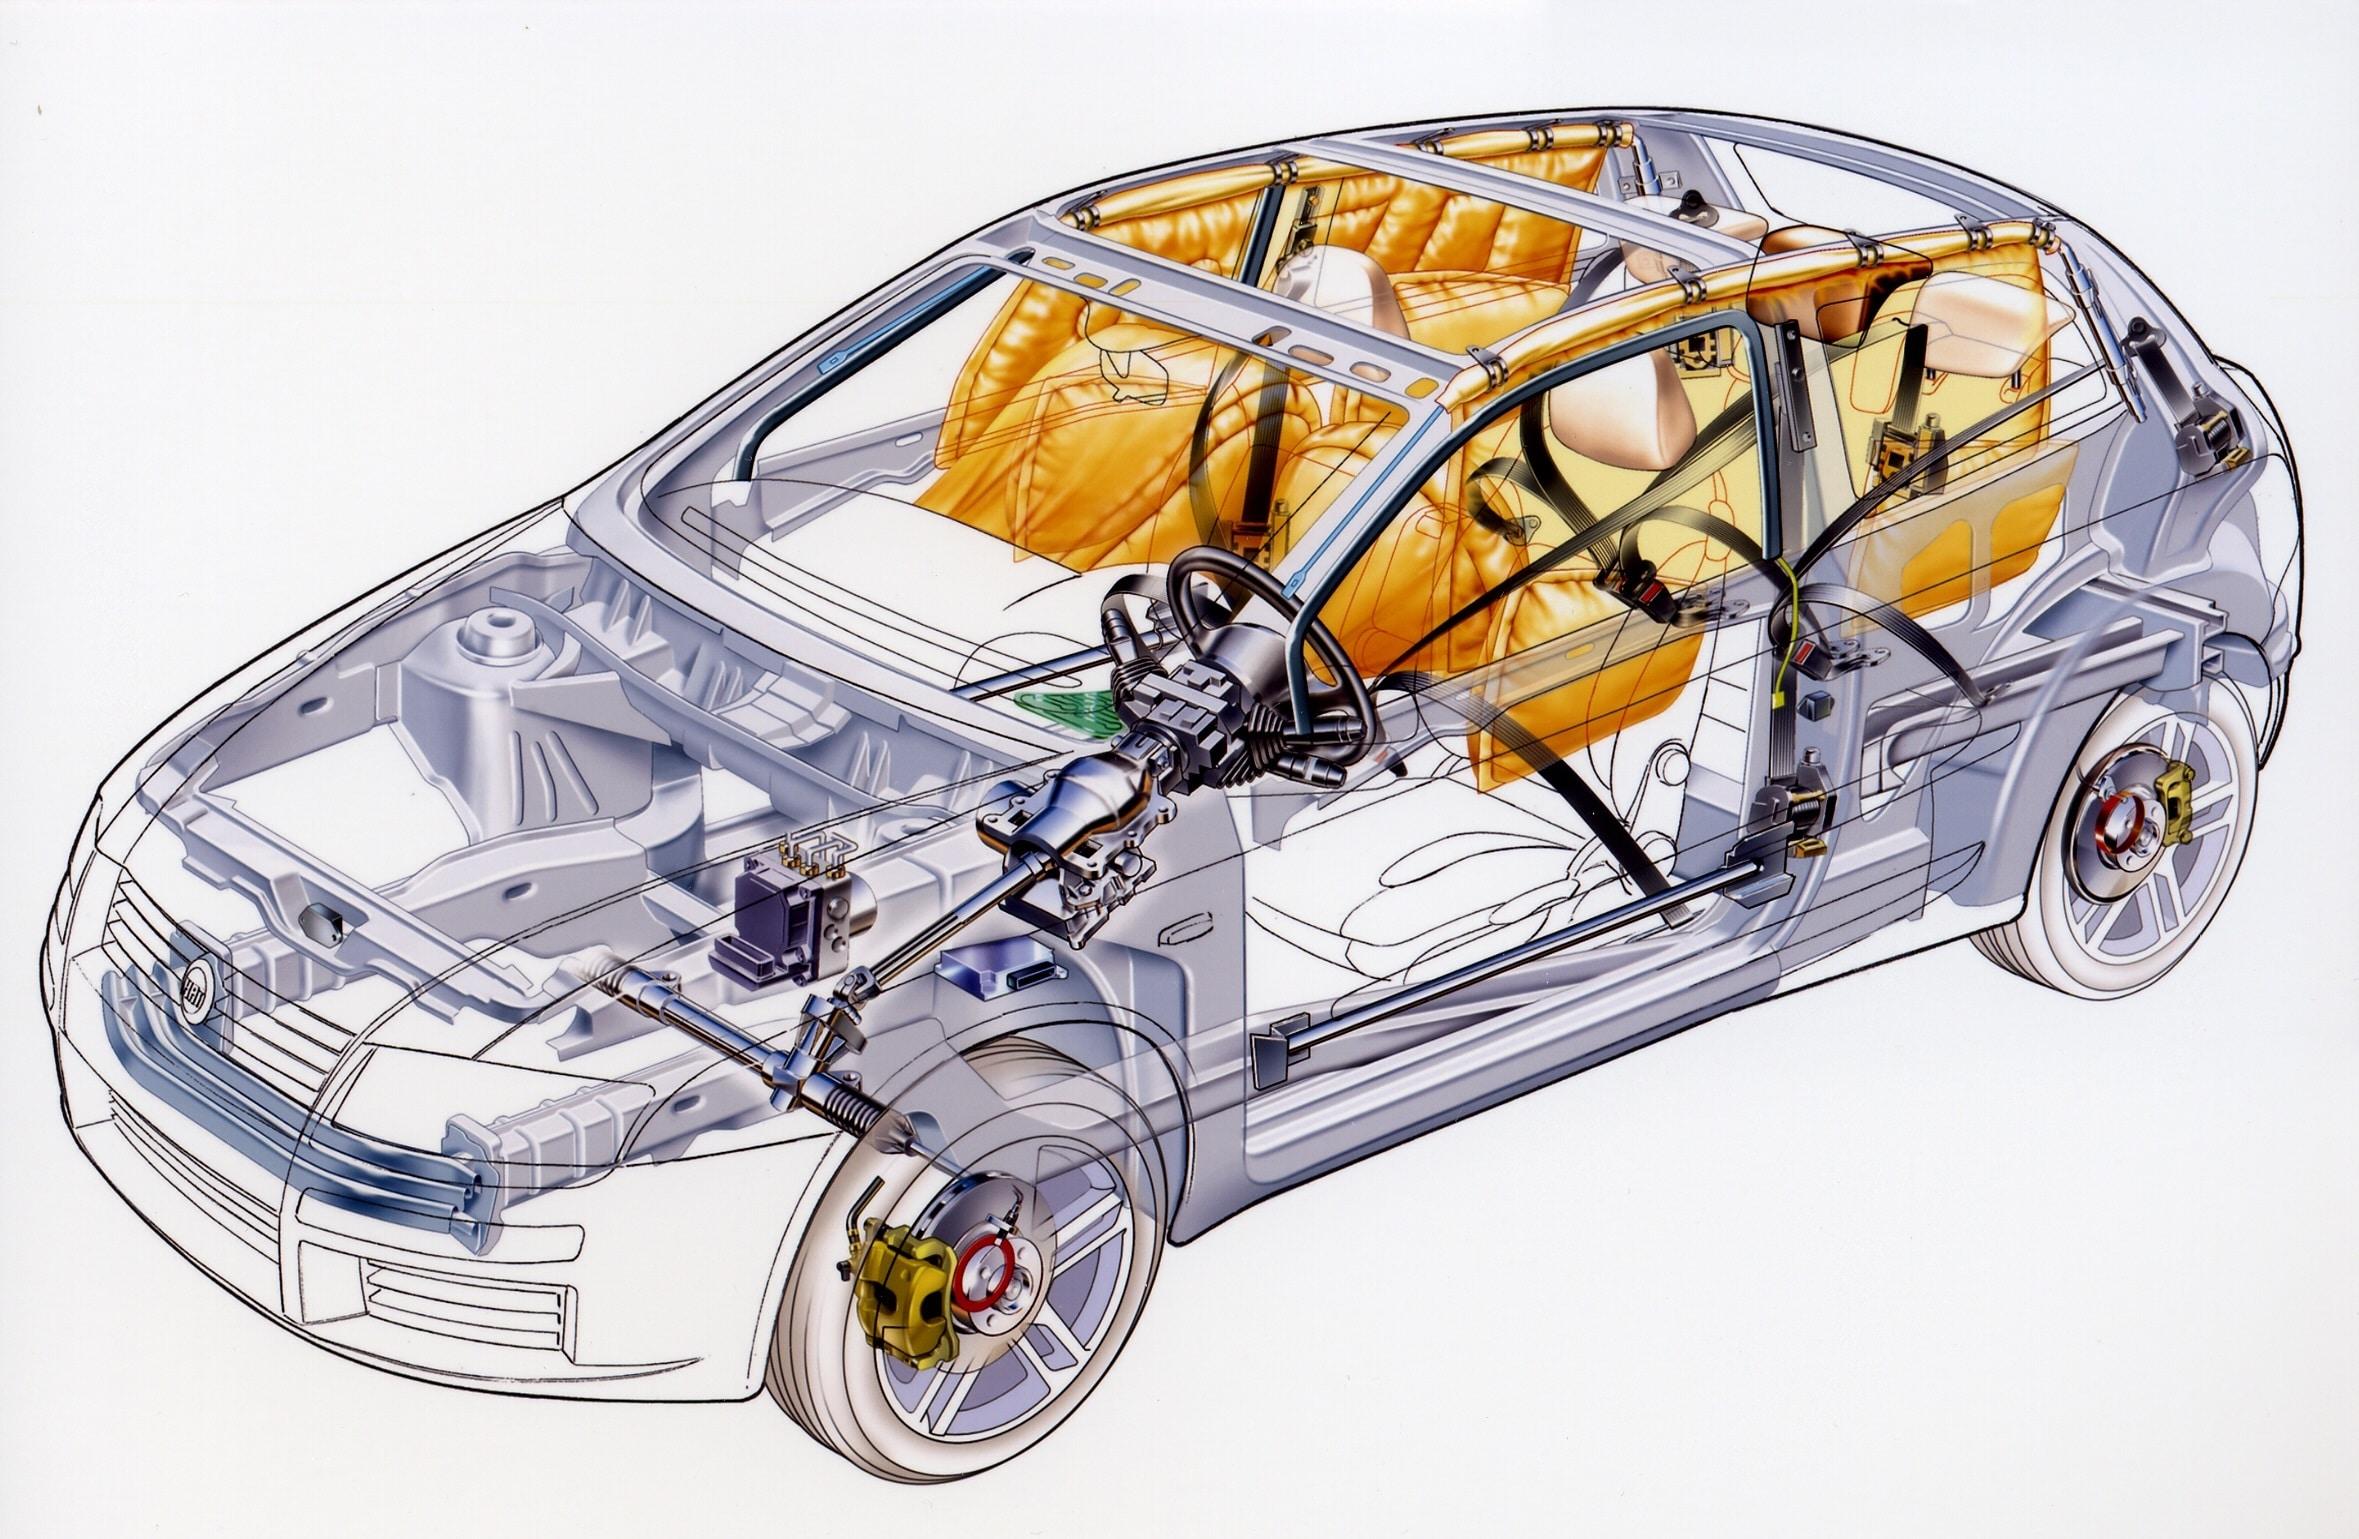 Fiat Stilo Abarth, Fiat, Stilo, Abarth, Stilo Abarth, Fiat Abarth, hatchback, hot hatch, five-cylinder, 20v, 20 valve, performance hatch, Italian car, Selespeed, motoring, automotive, car, cars, ebay, ebay motors, autotrader